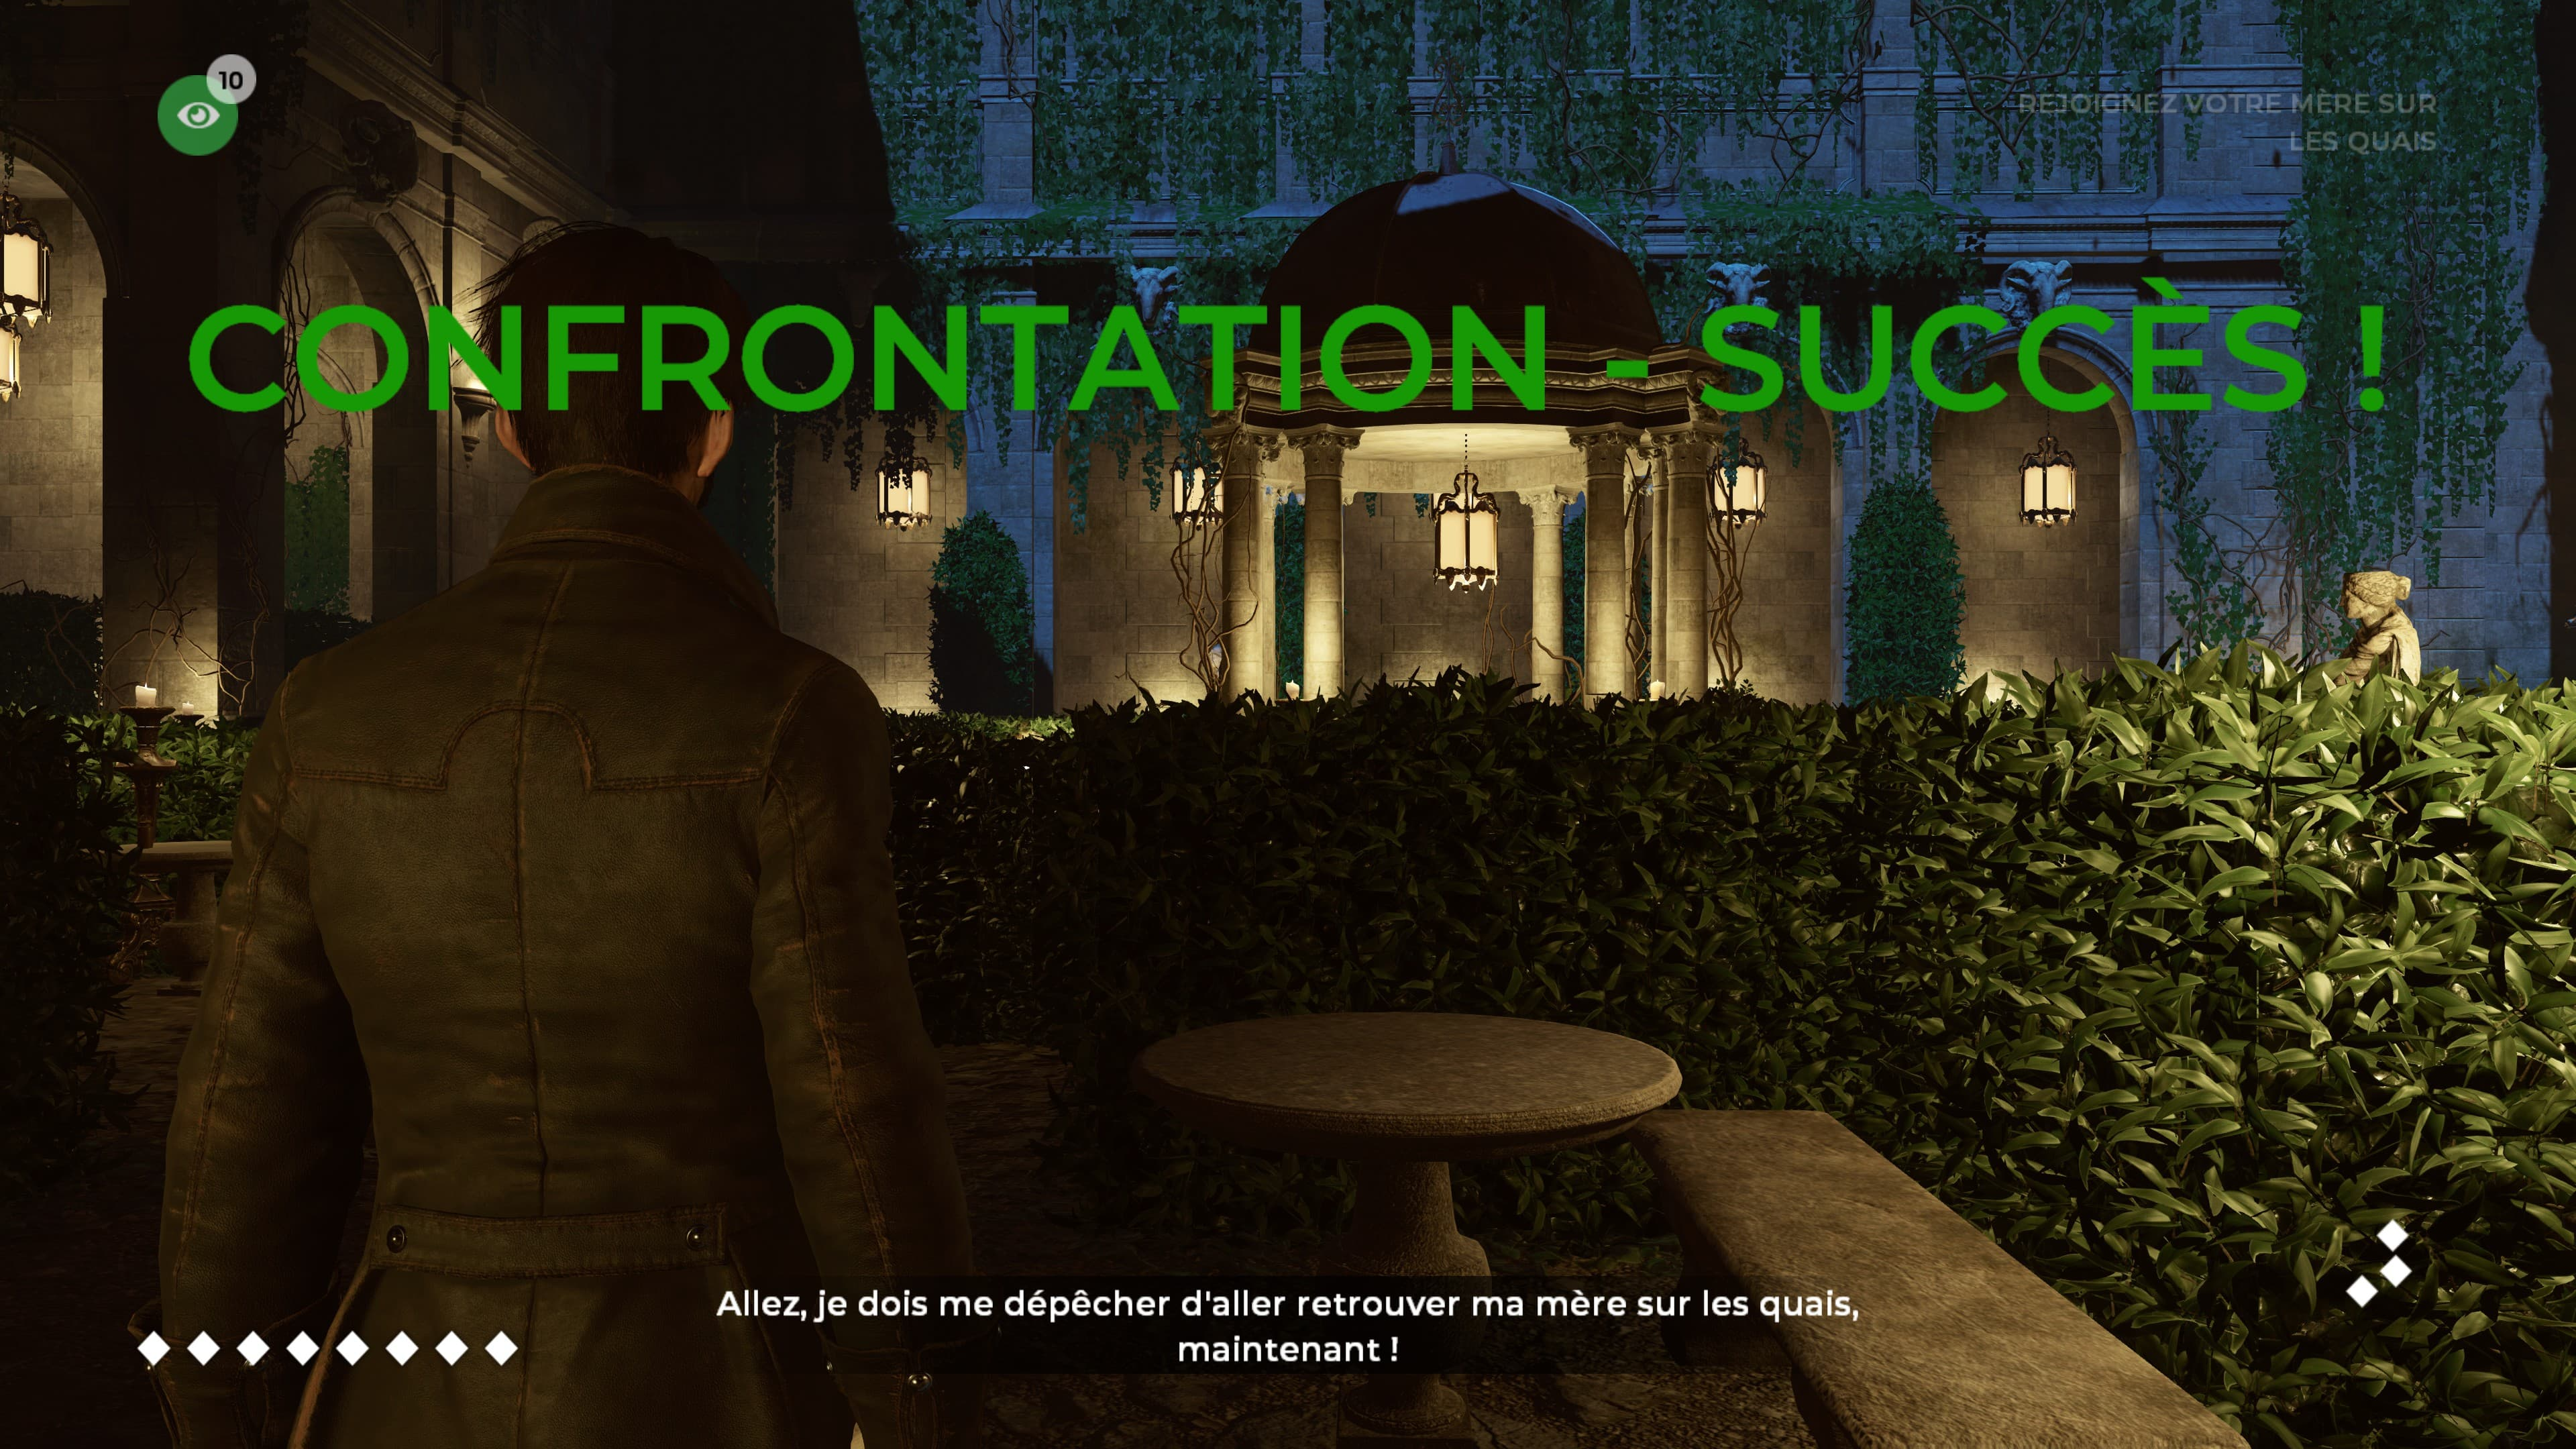 Xbox One The Council: Episode 4 - Burning Bridges